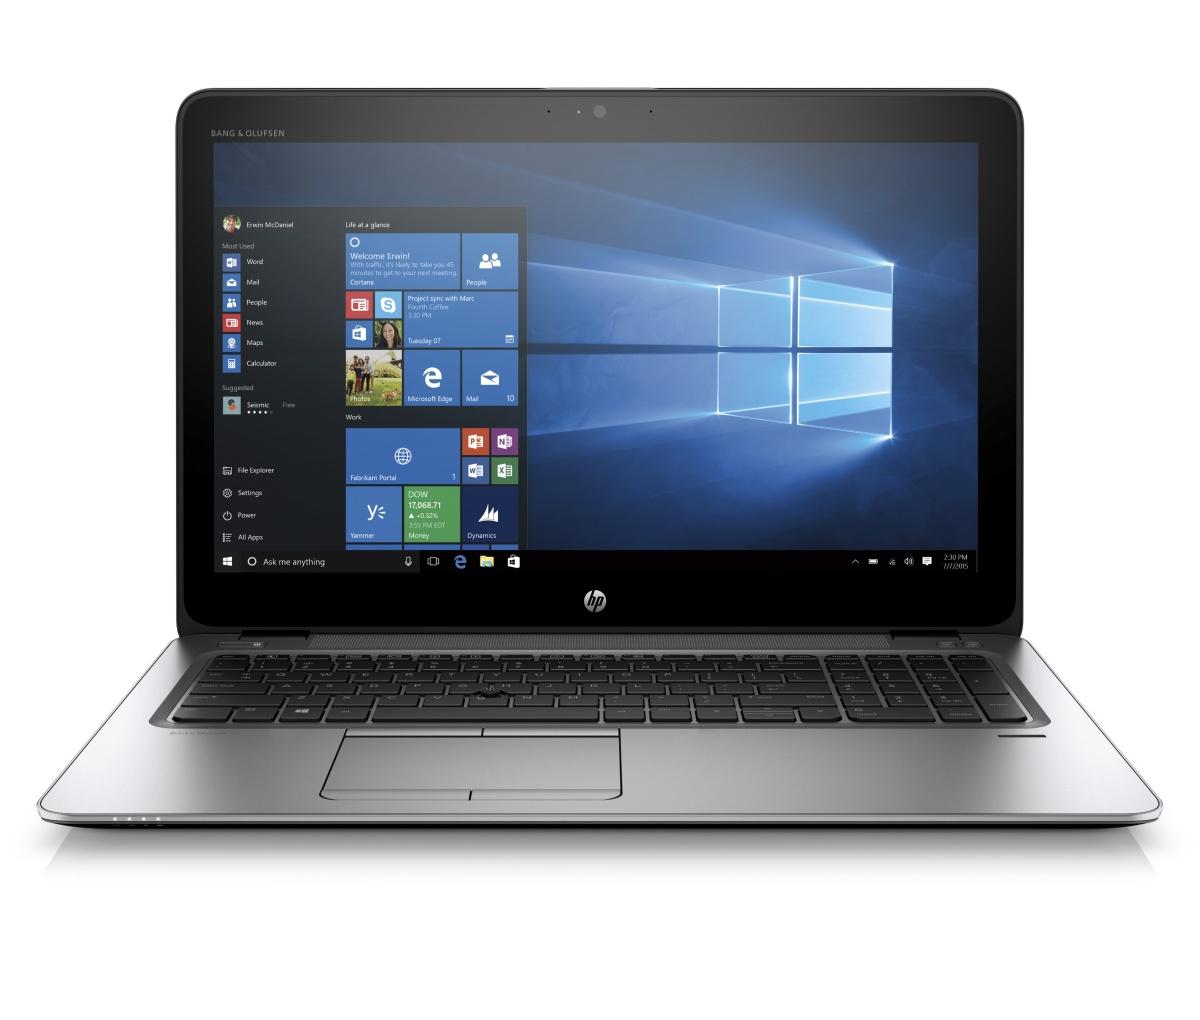 "HP EliteBook 850 G3 15.6"" FHD /i5-6200U/4GB/256SSD/WIFI/BT/MCR/FPR/3RServis/7+10P"